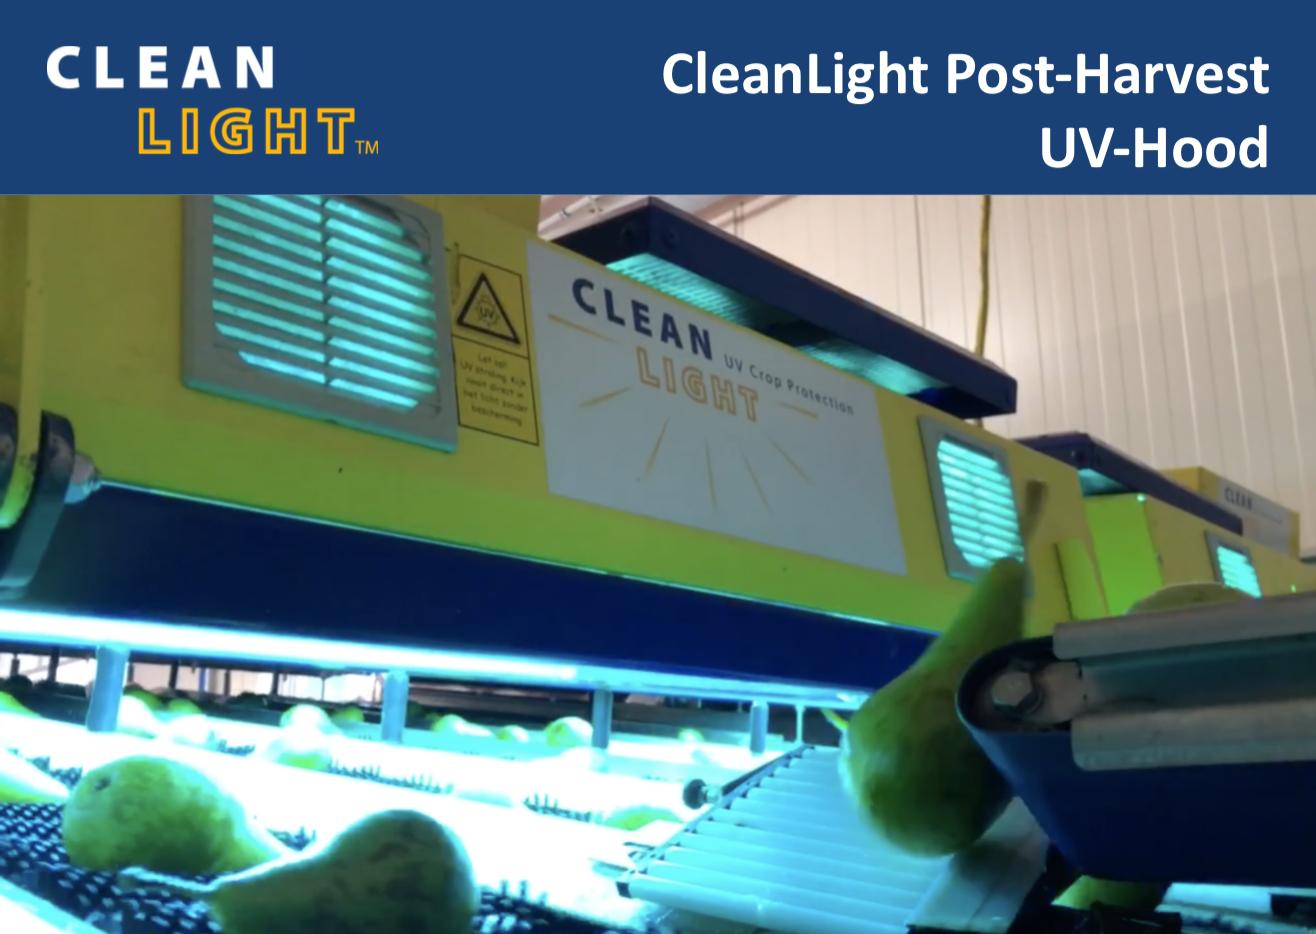 Productsheet UV-Hood